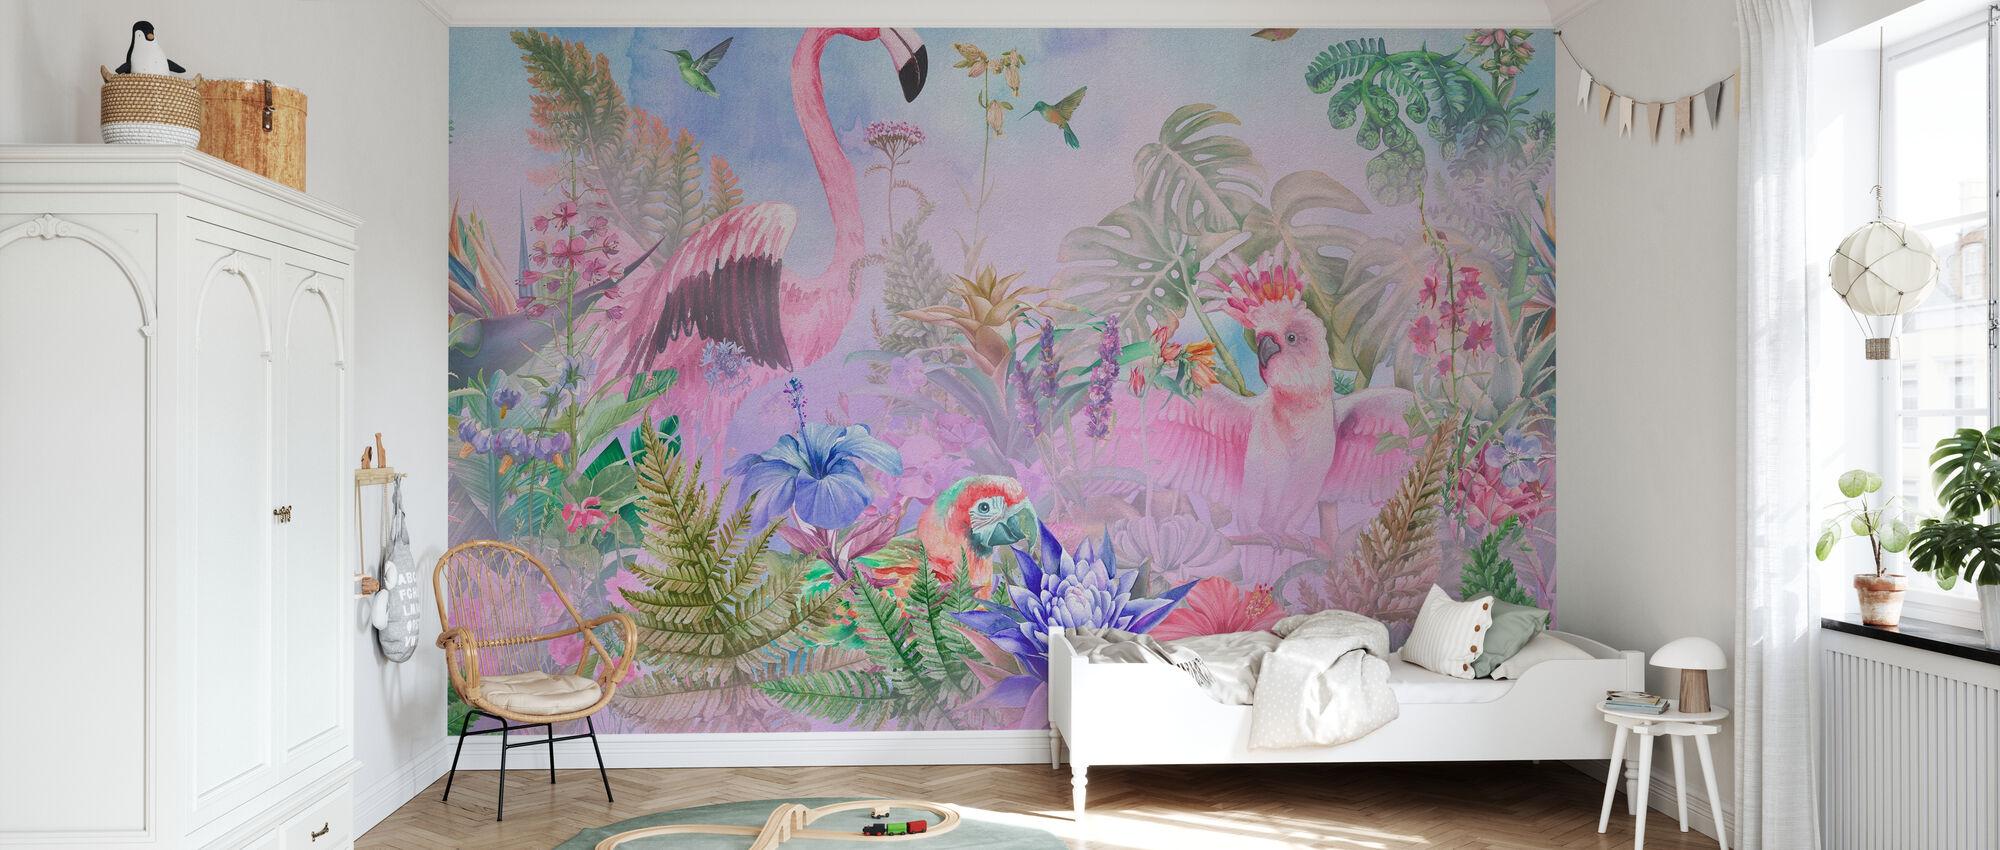 Riesiger Flamingo - Tapete - Kinderzimmer